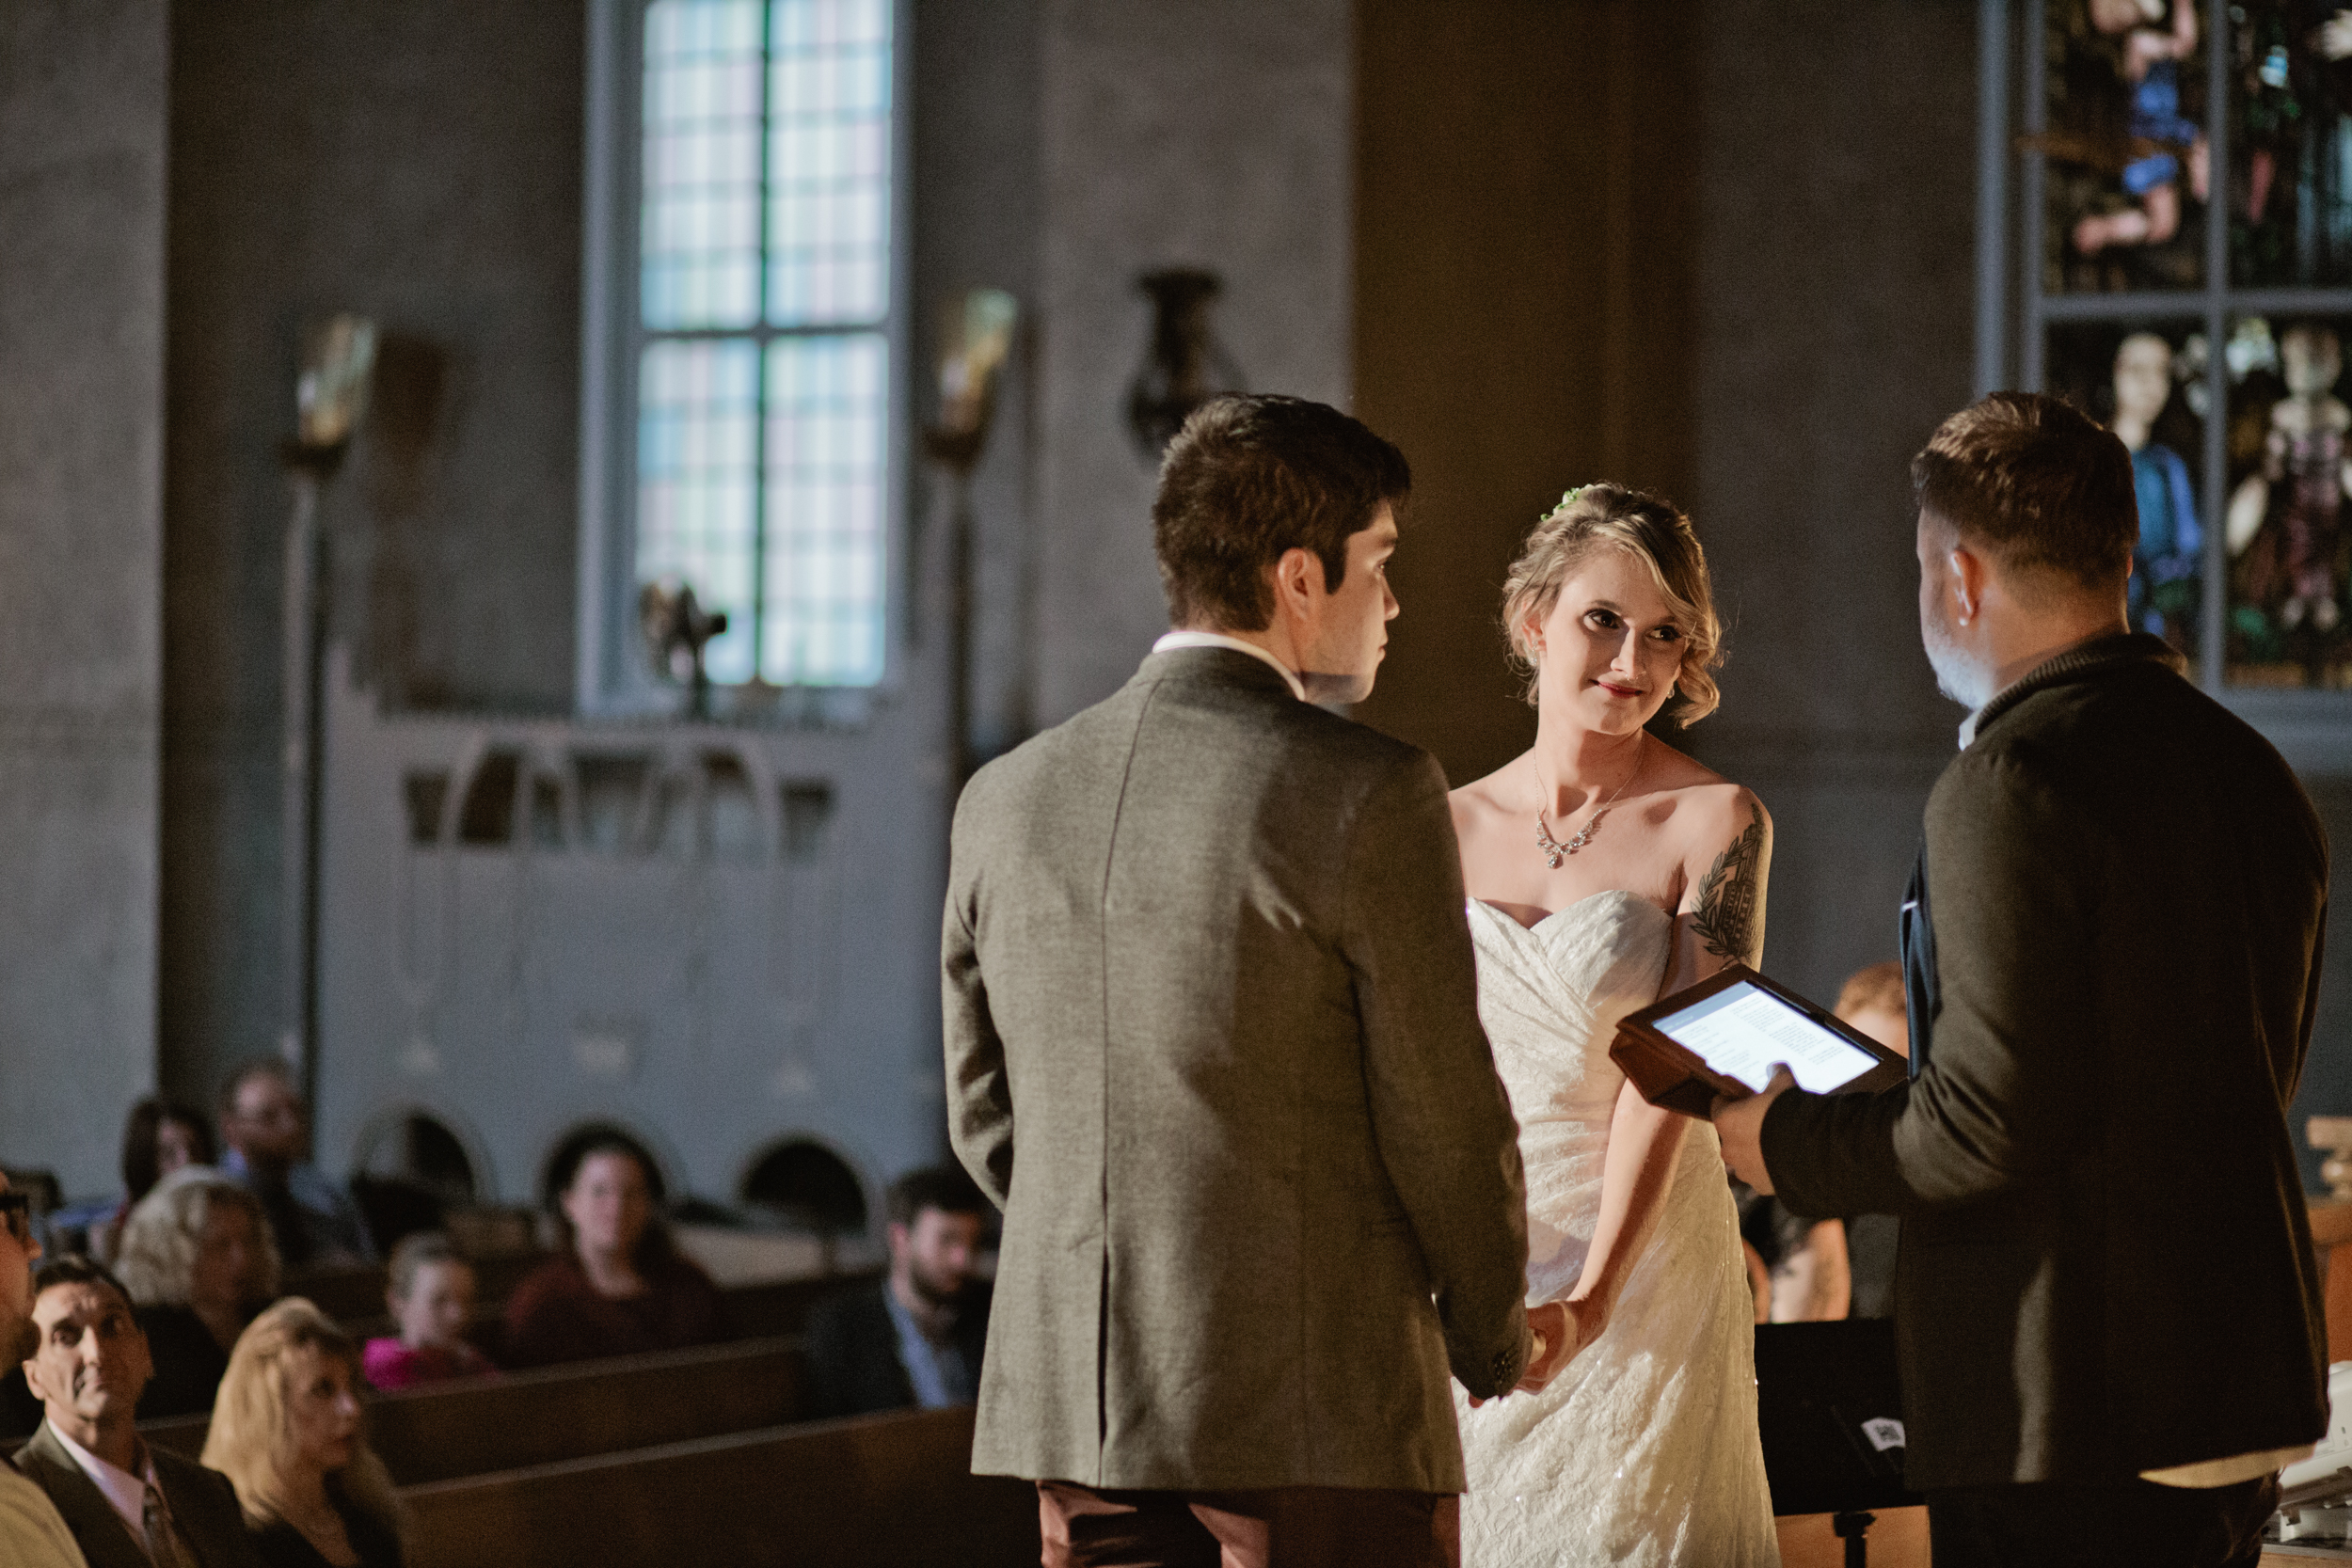 providence-wedding-photographer-87.jpg